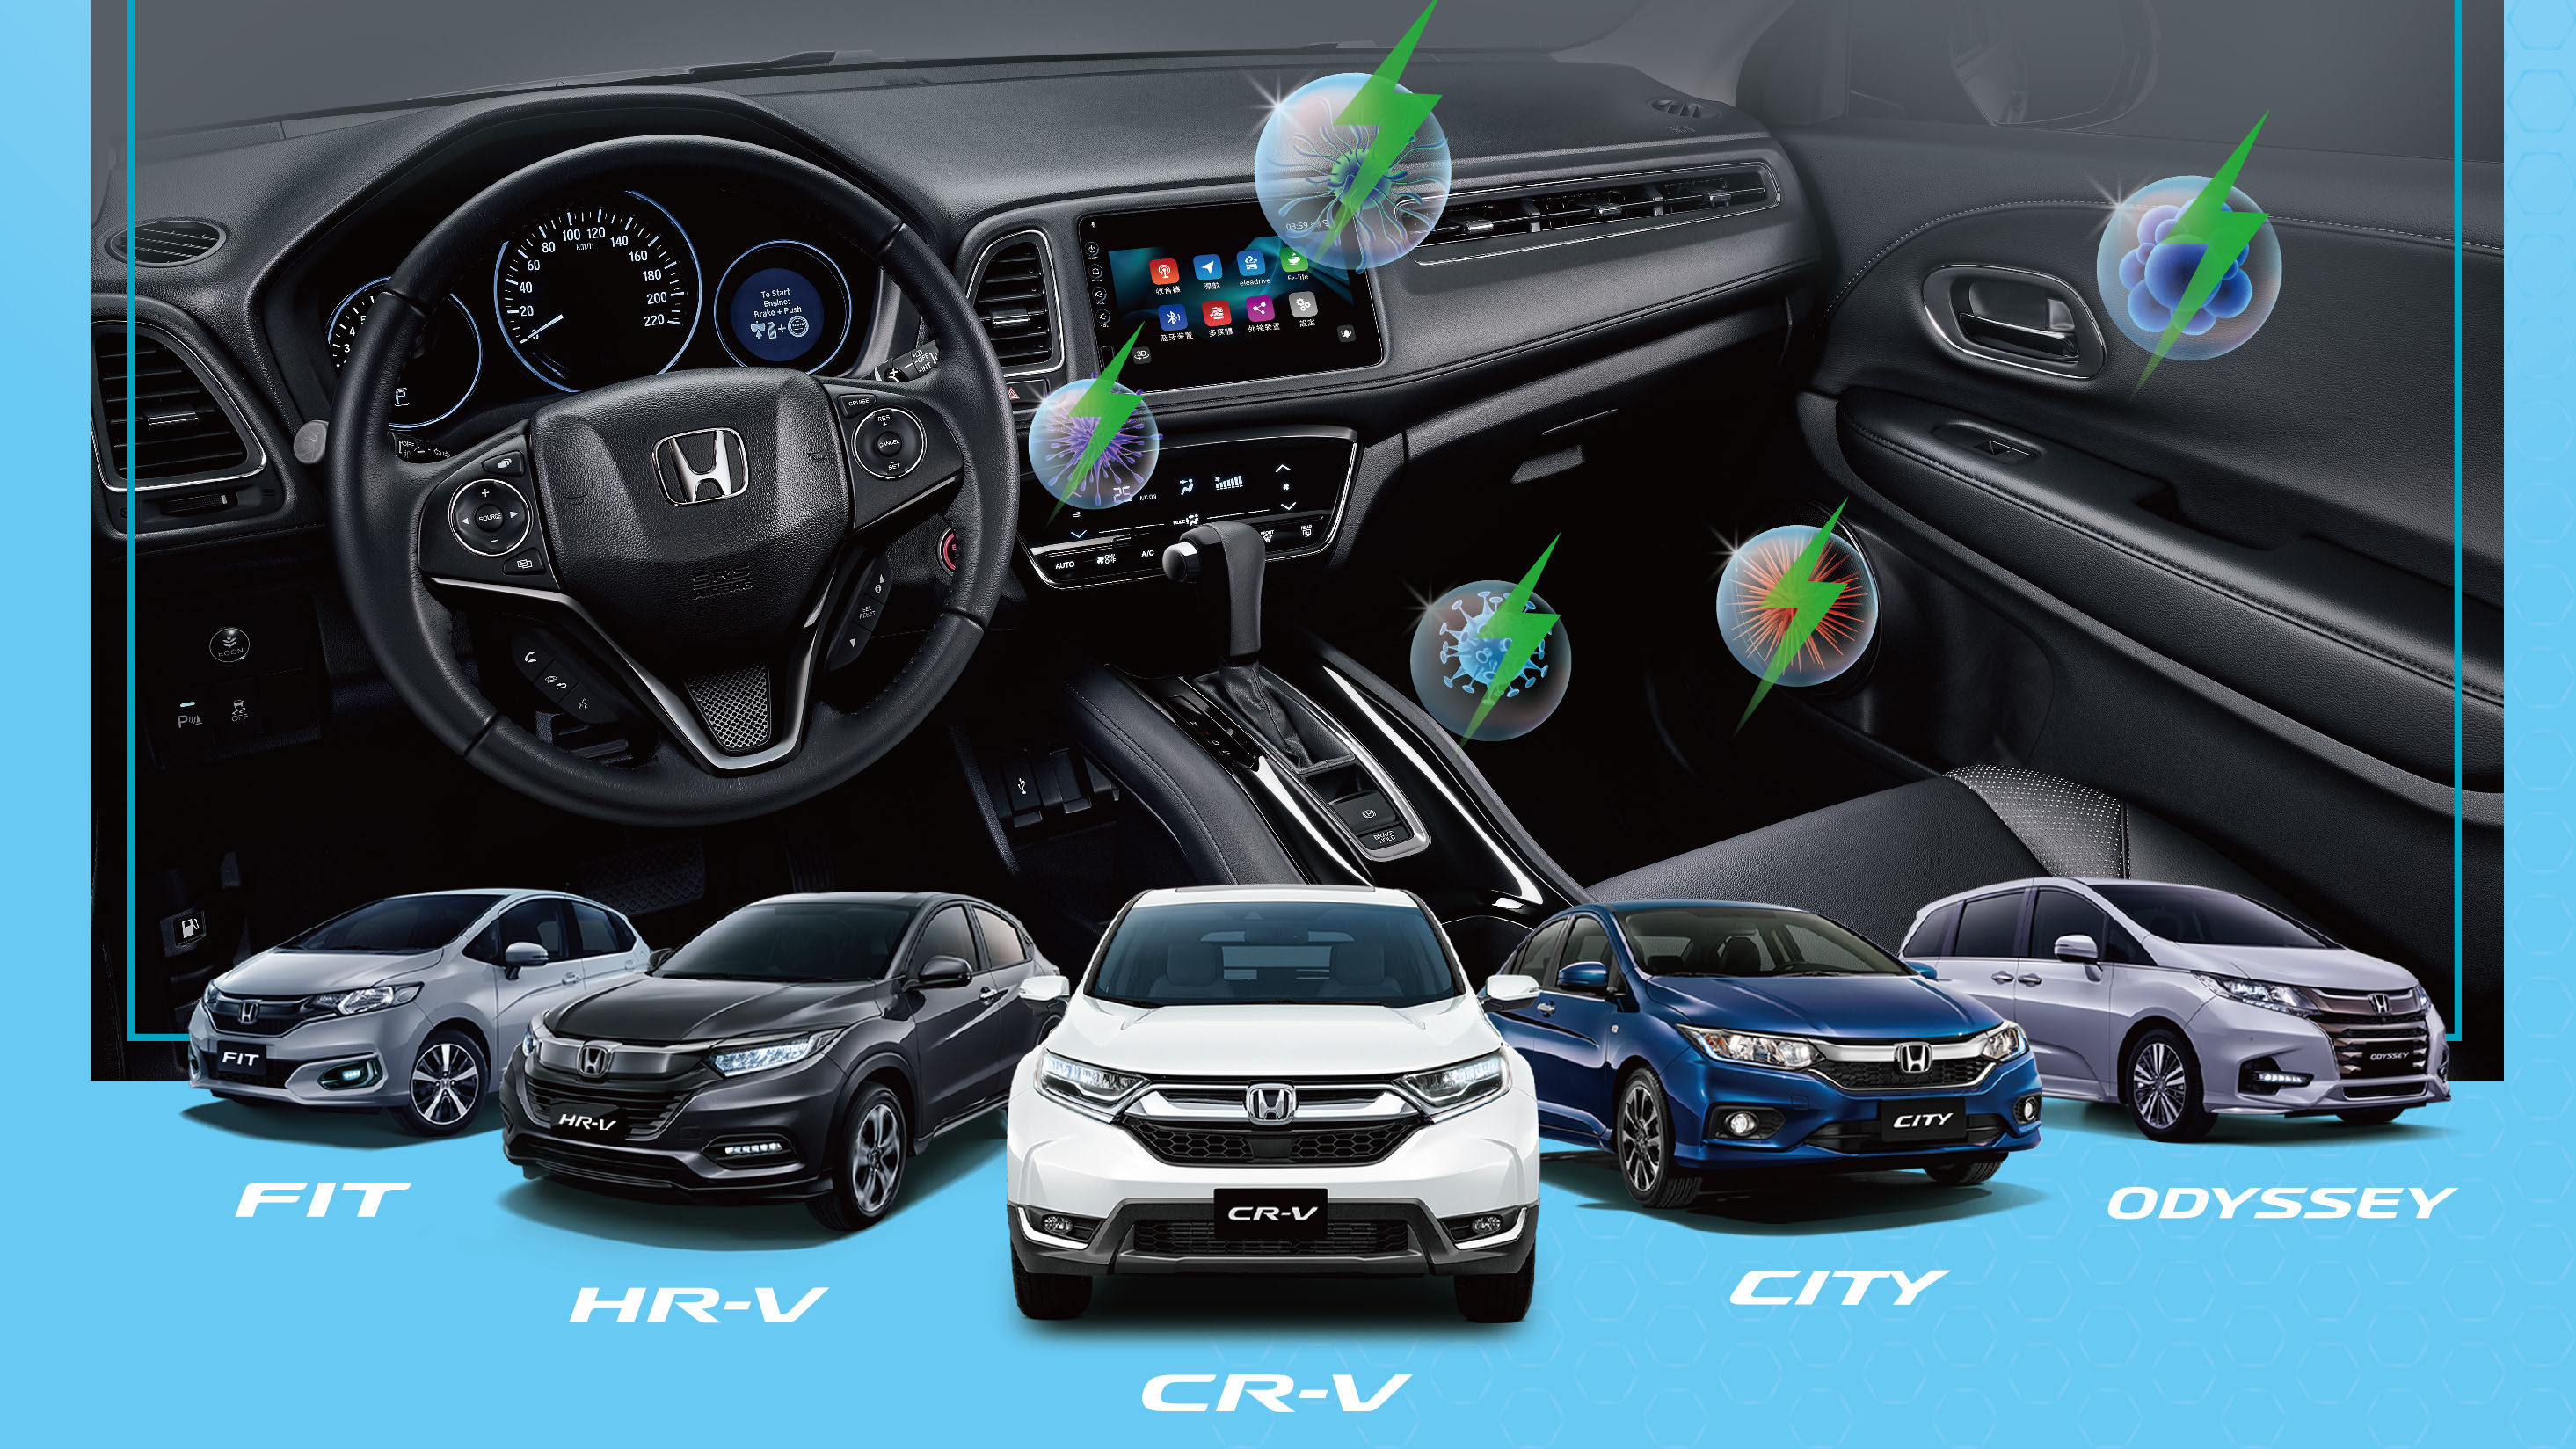 Honda 三月送除菌系統,HR-V 享限量優惠、CR-V 還有 70 萬 0 利率!